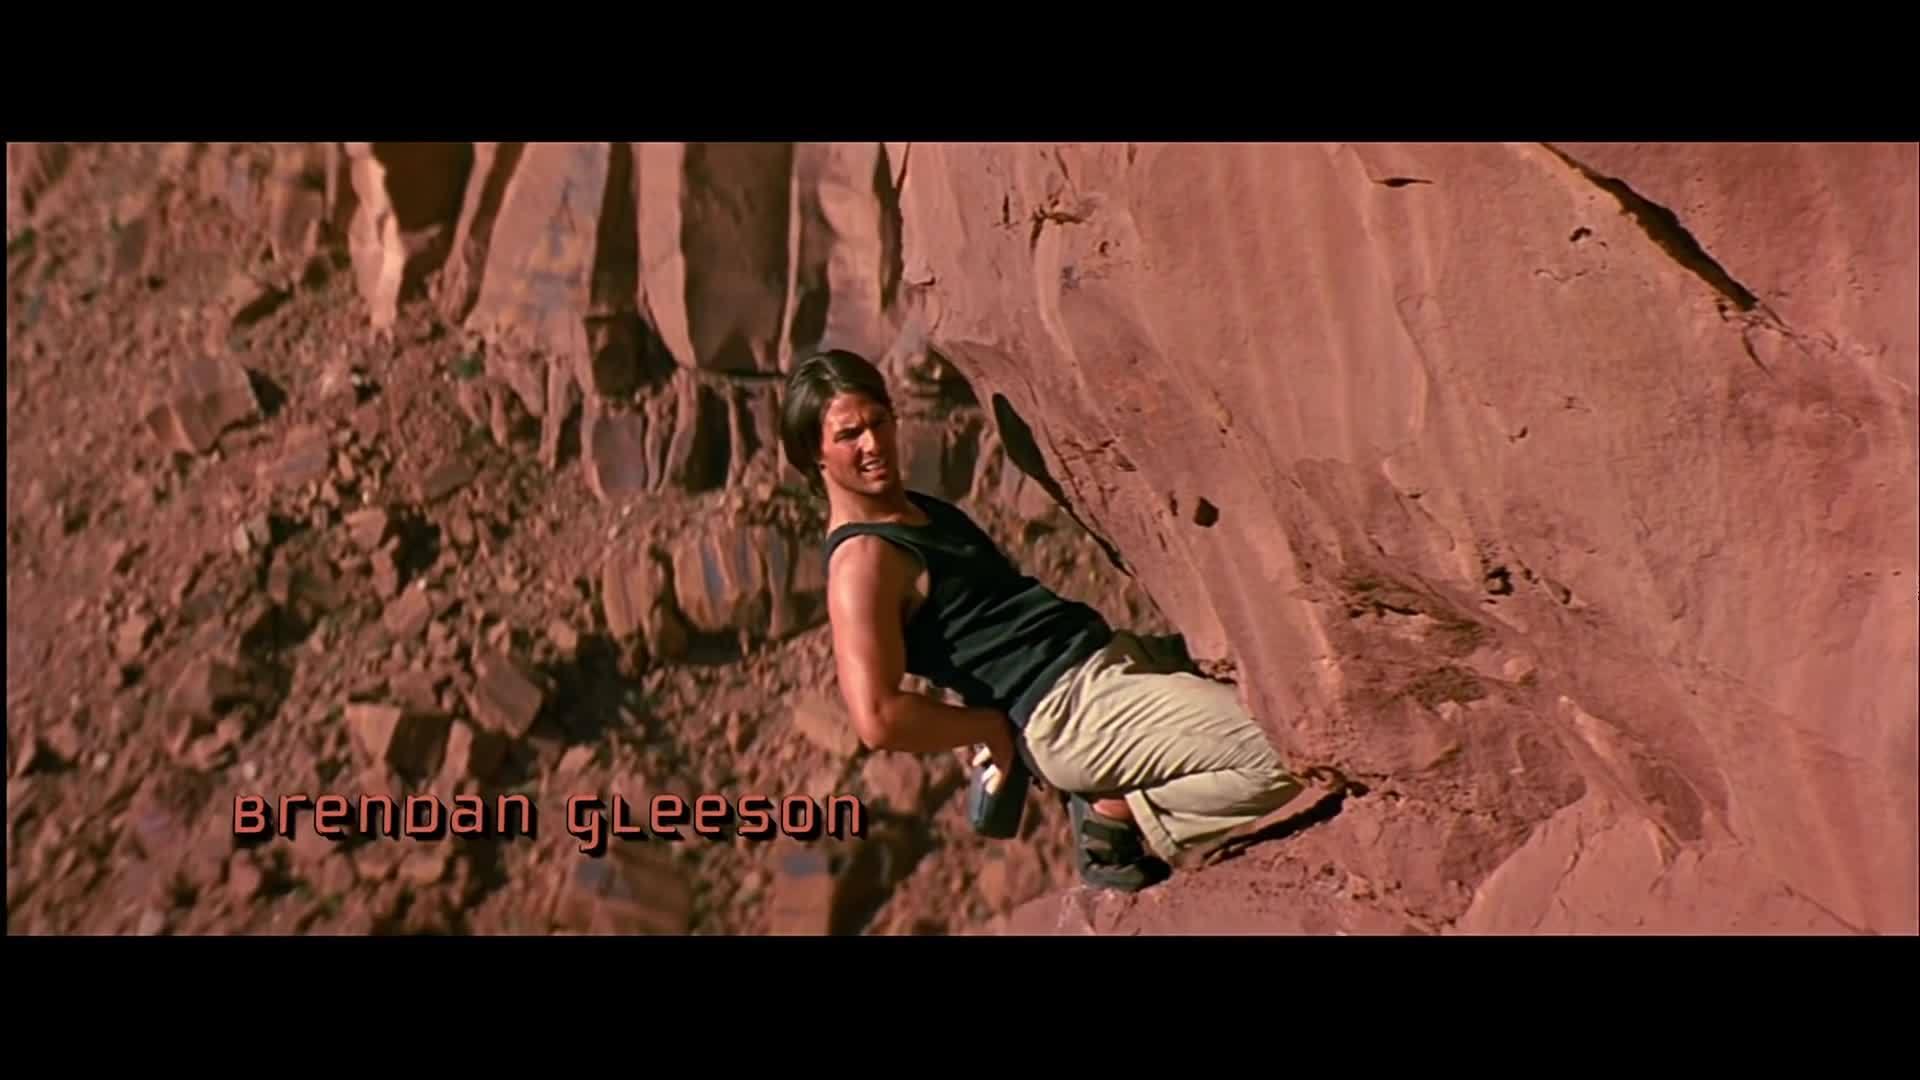 Leo vách núi trong Mission: Impossible 2